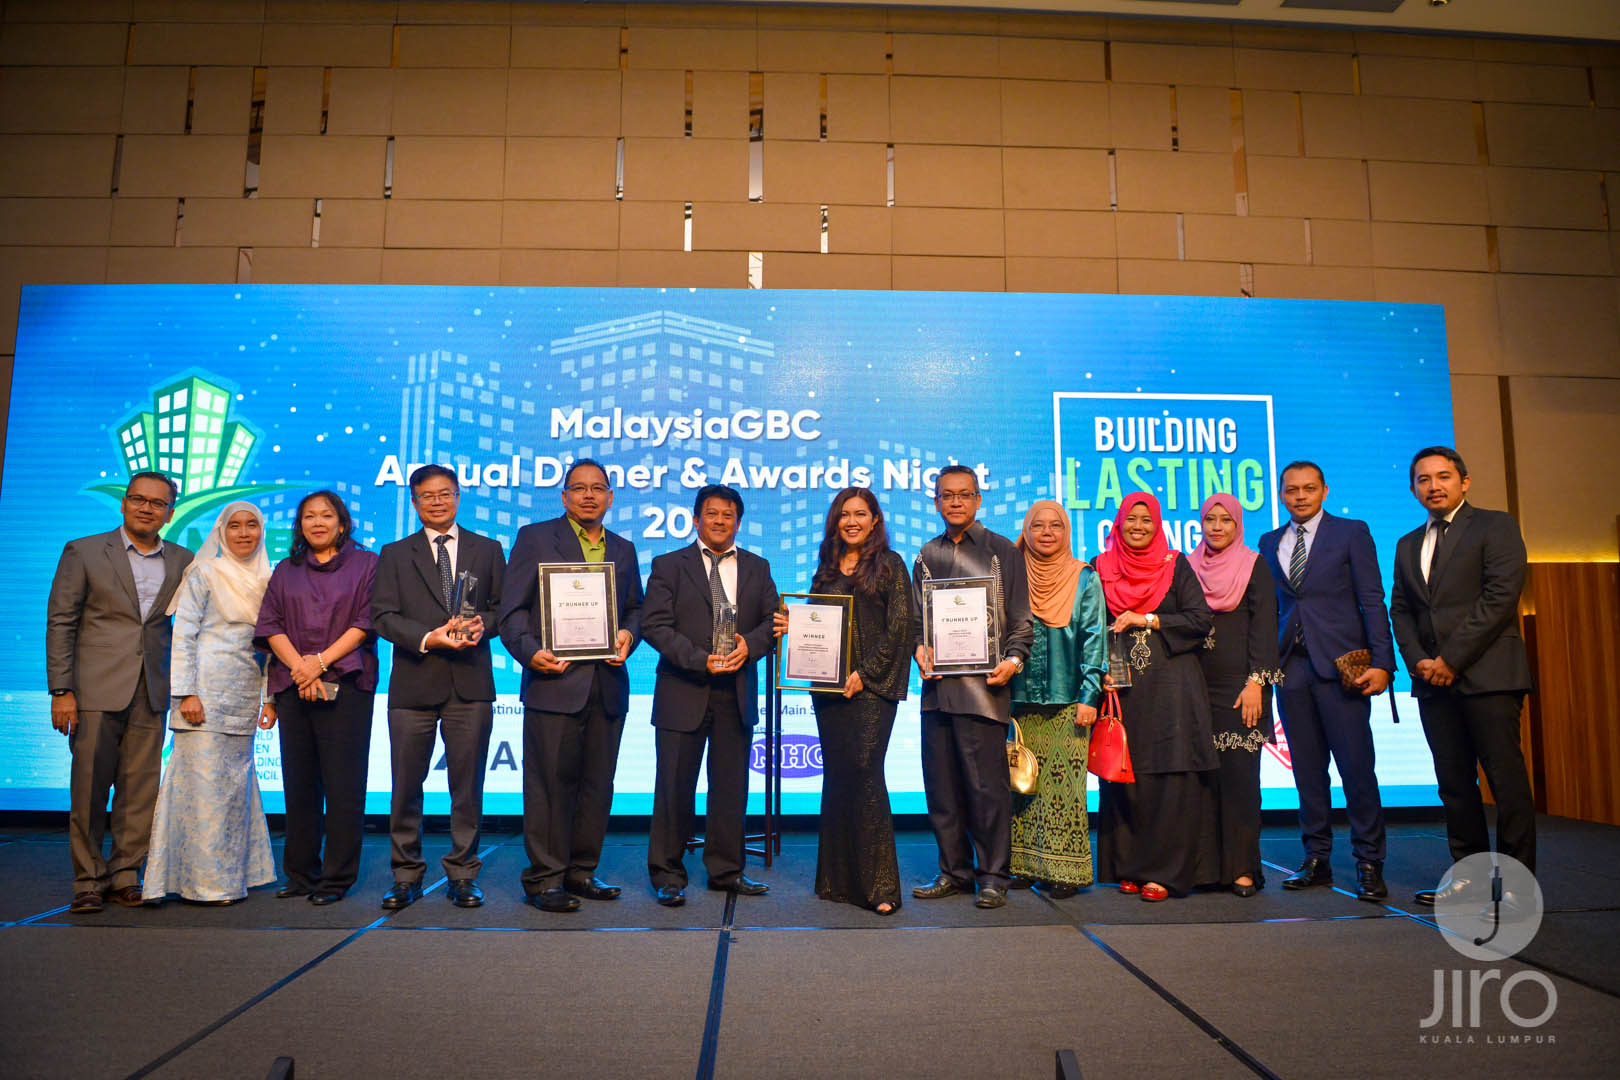 11 May 2018 : MalaysiaGBC Awards 2018 3